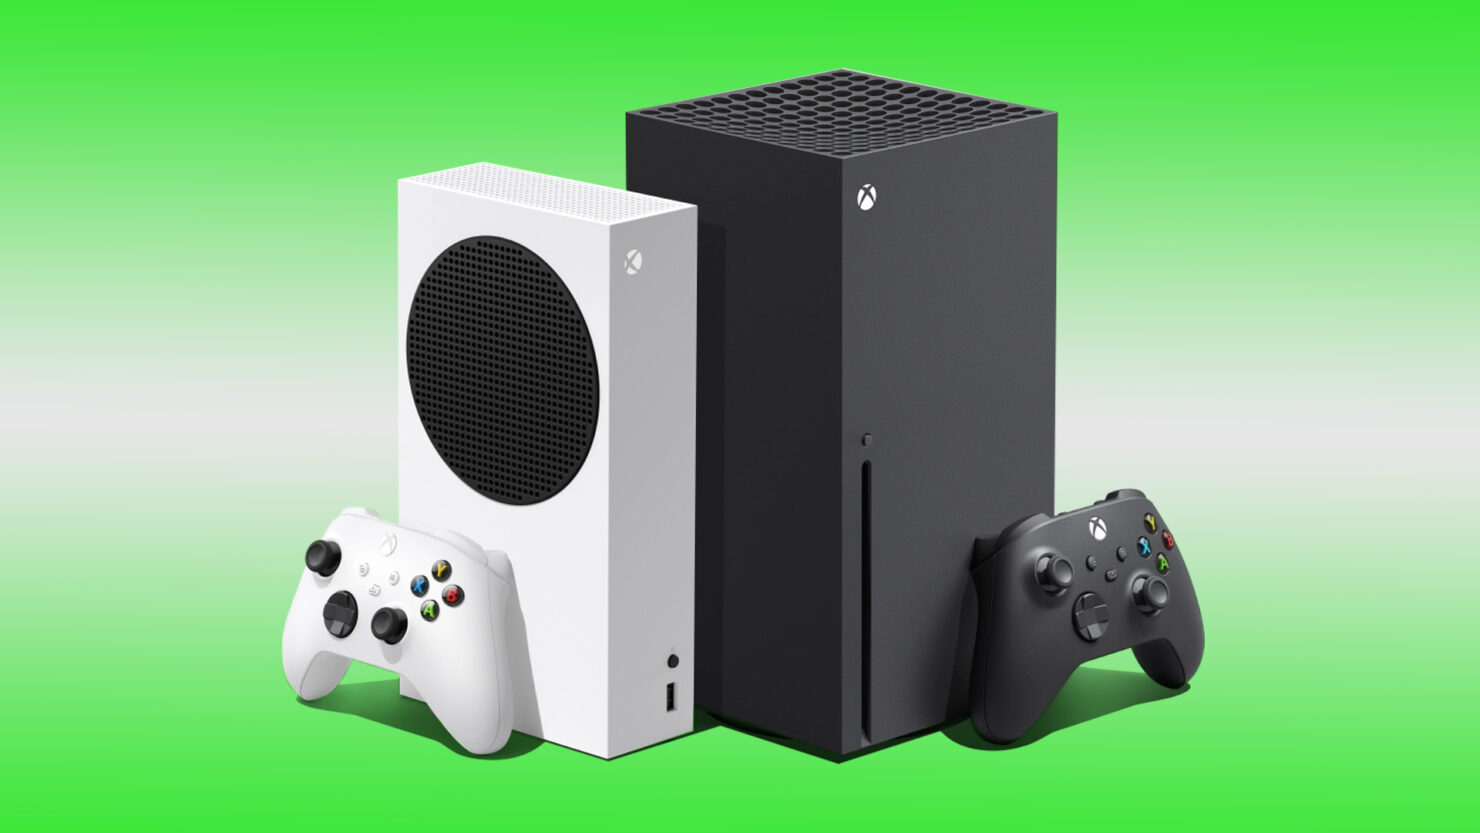 Microsoft Xbox Series X and S Next-Gen